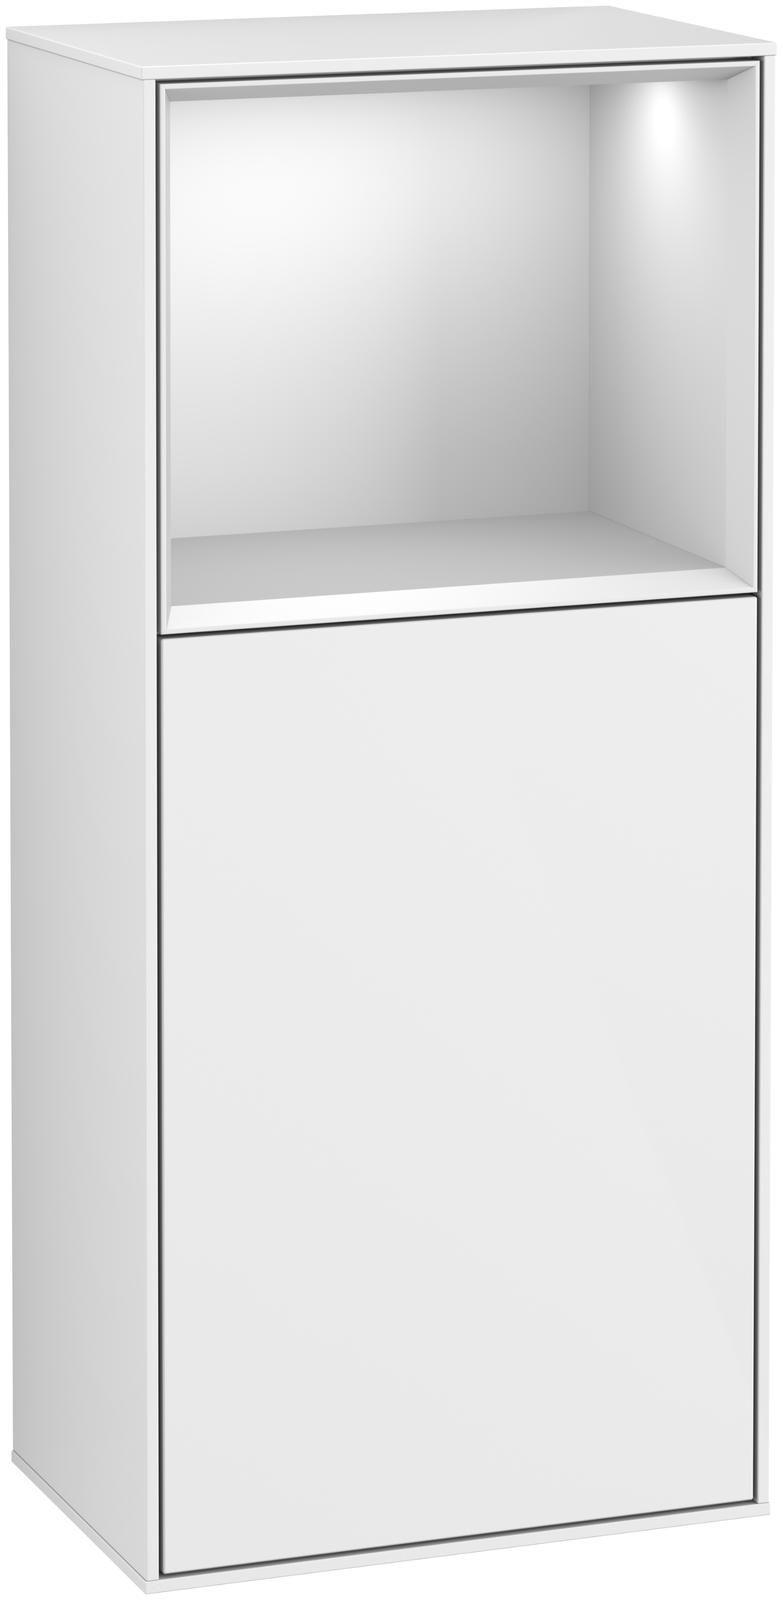 Villeroy & Boch Finion G51 Seitenschrank mit Regalelement 1 Tür Anschlag rechts LED-Beleuchtung B:41,8xH:93,6xT:27cm Front, Korpus: Glossy White Lack, Regal: Weiß Matt Soft Grey G510MTGF